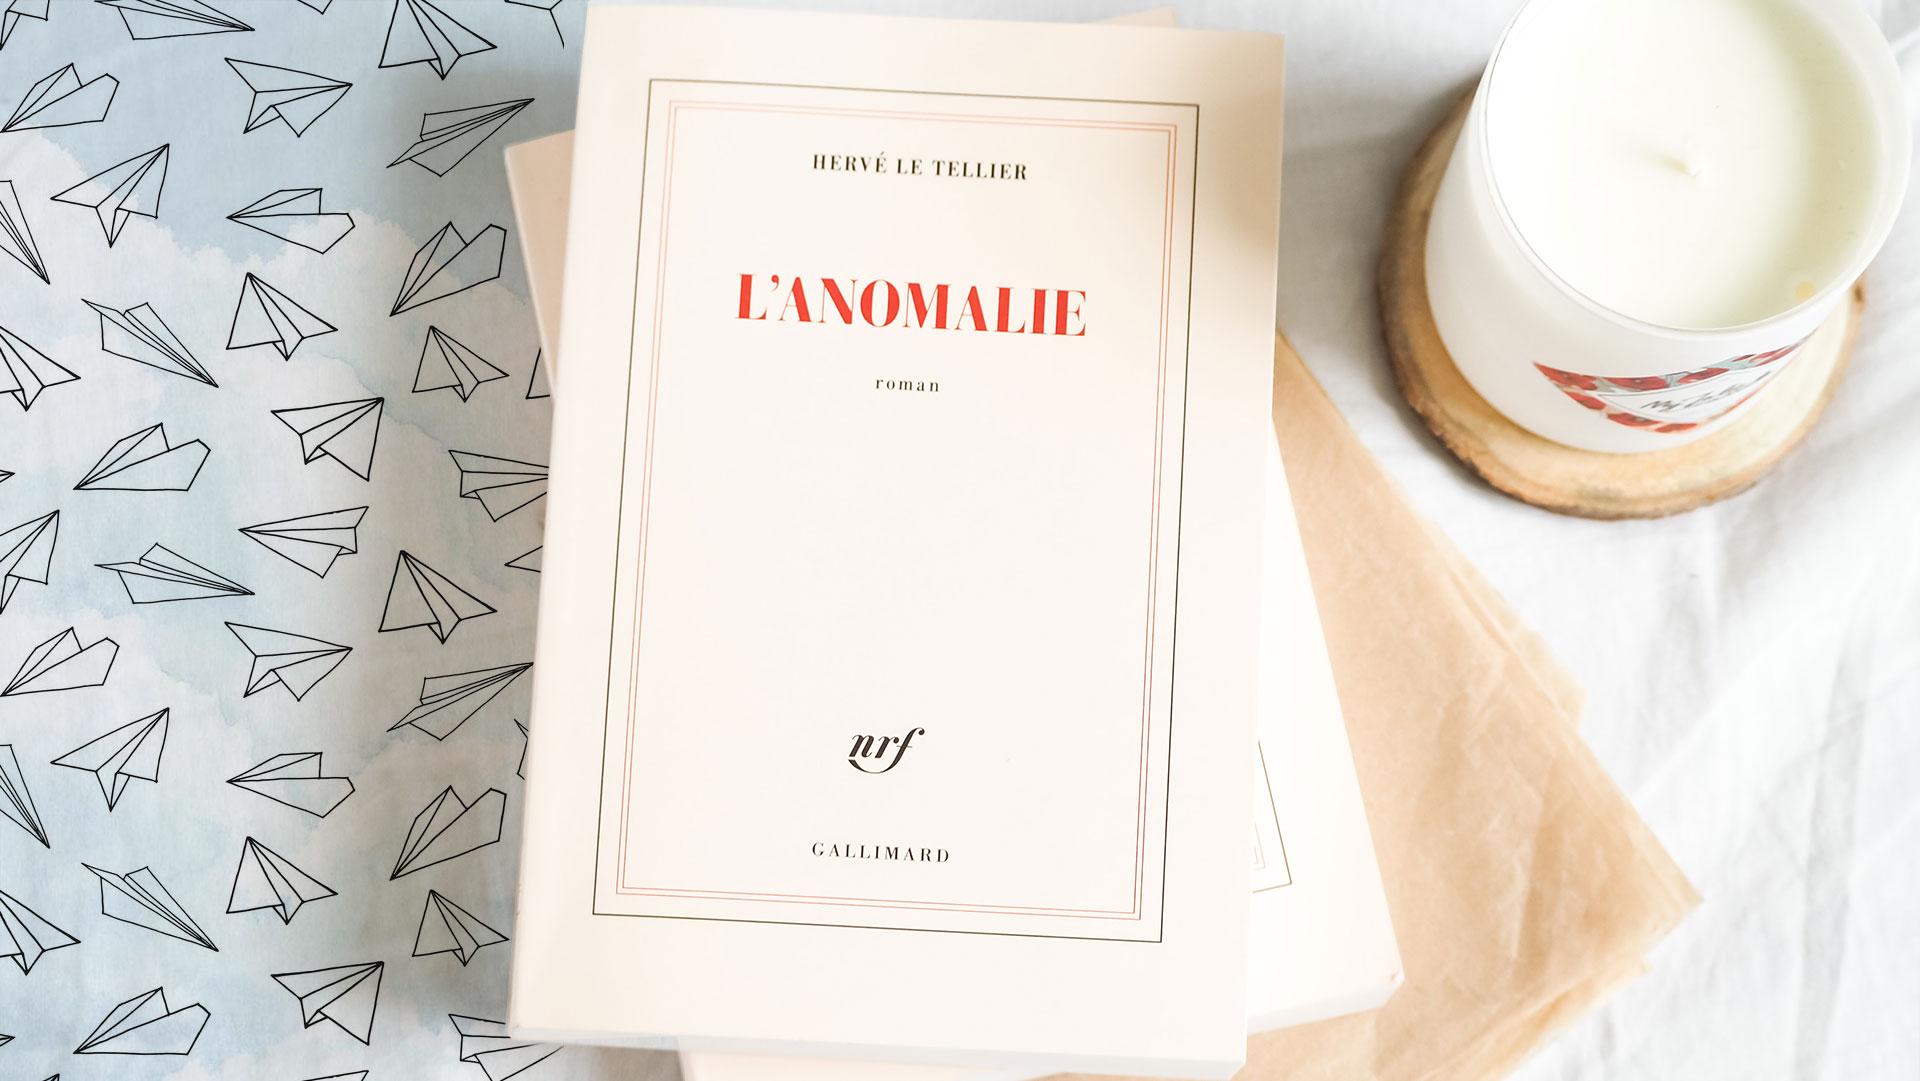 lanomalie-Herve-Le-Tellier